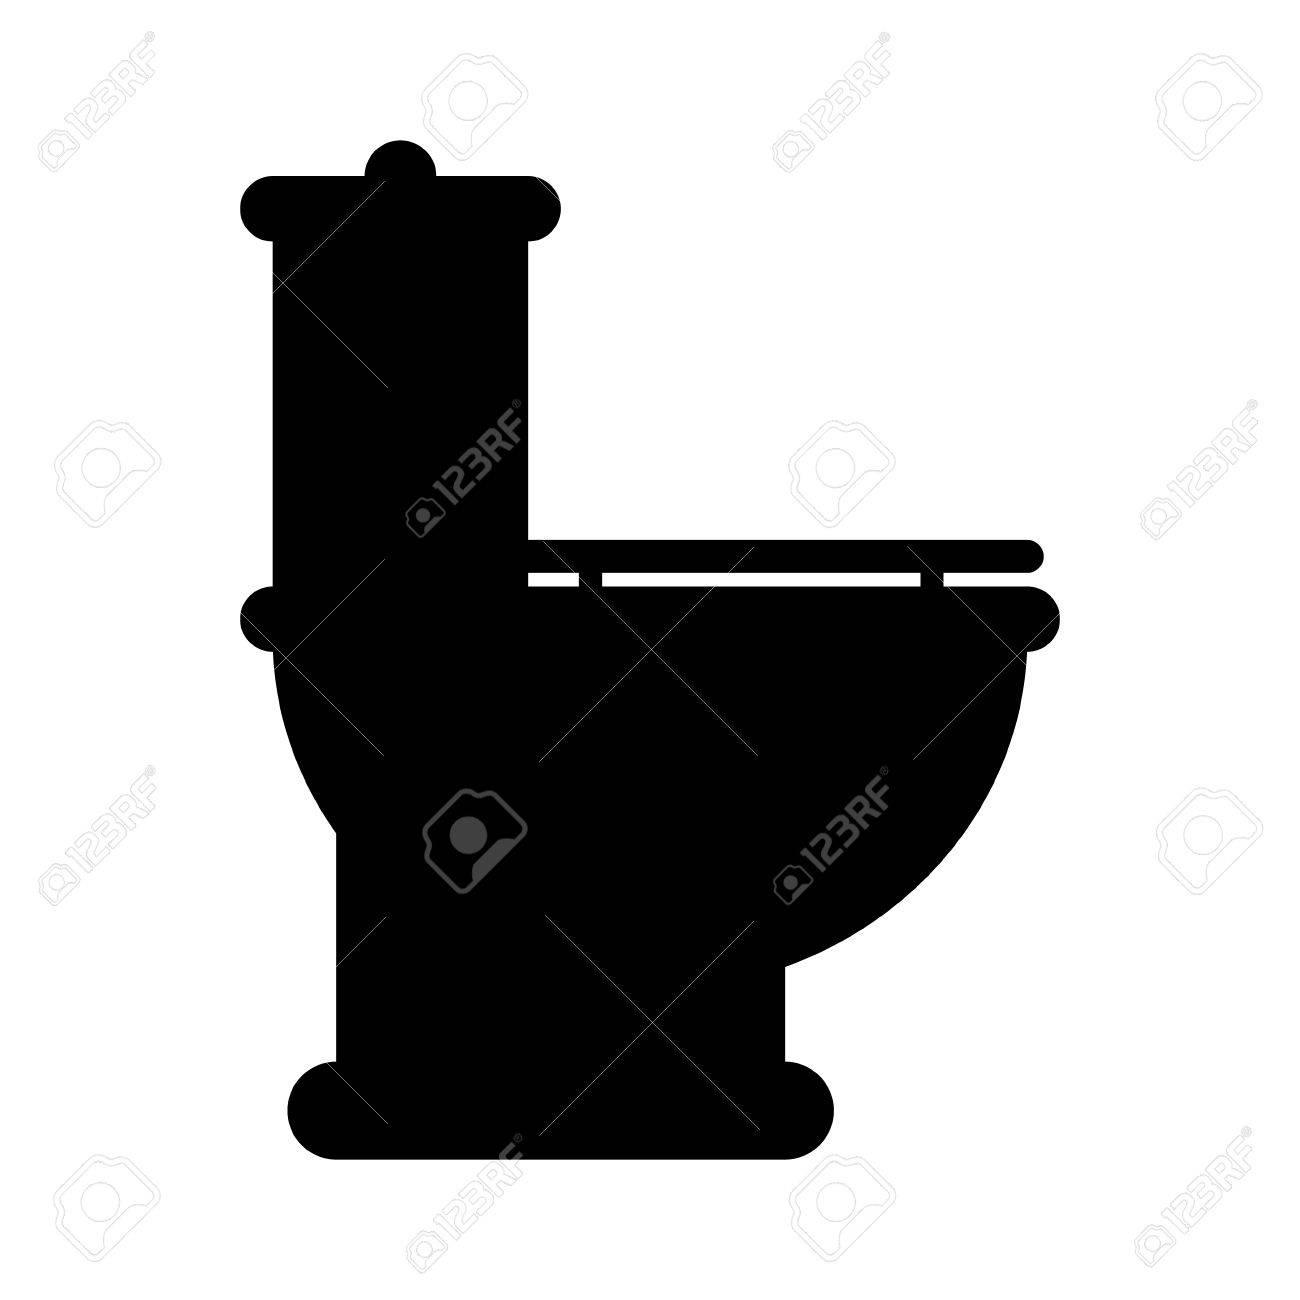 Toilet icon on white background  Stock Vector   28385957. Toilet Icon On White Background  Royalty Free Cliparts  Vectors